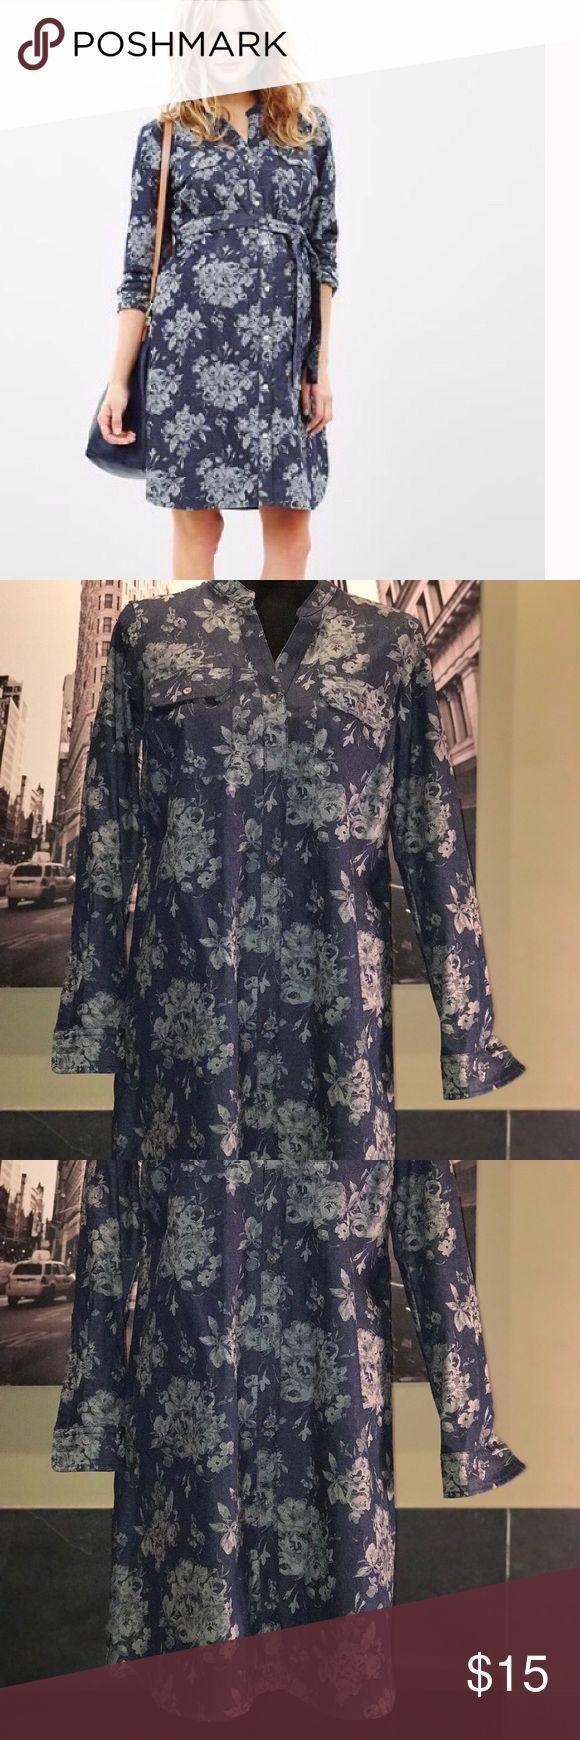 The 25 best denim maternity dresses ideas on pinterest summer gap denim maternity dress ombrellifo Image collections